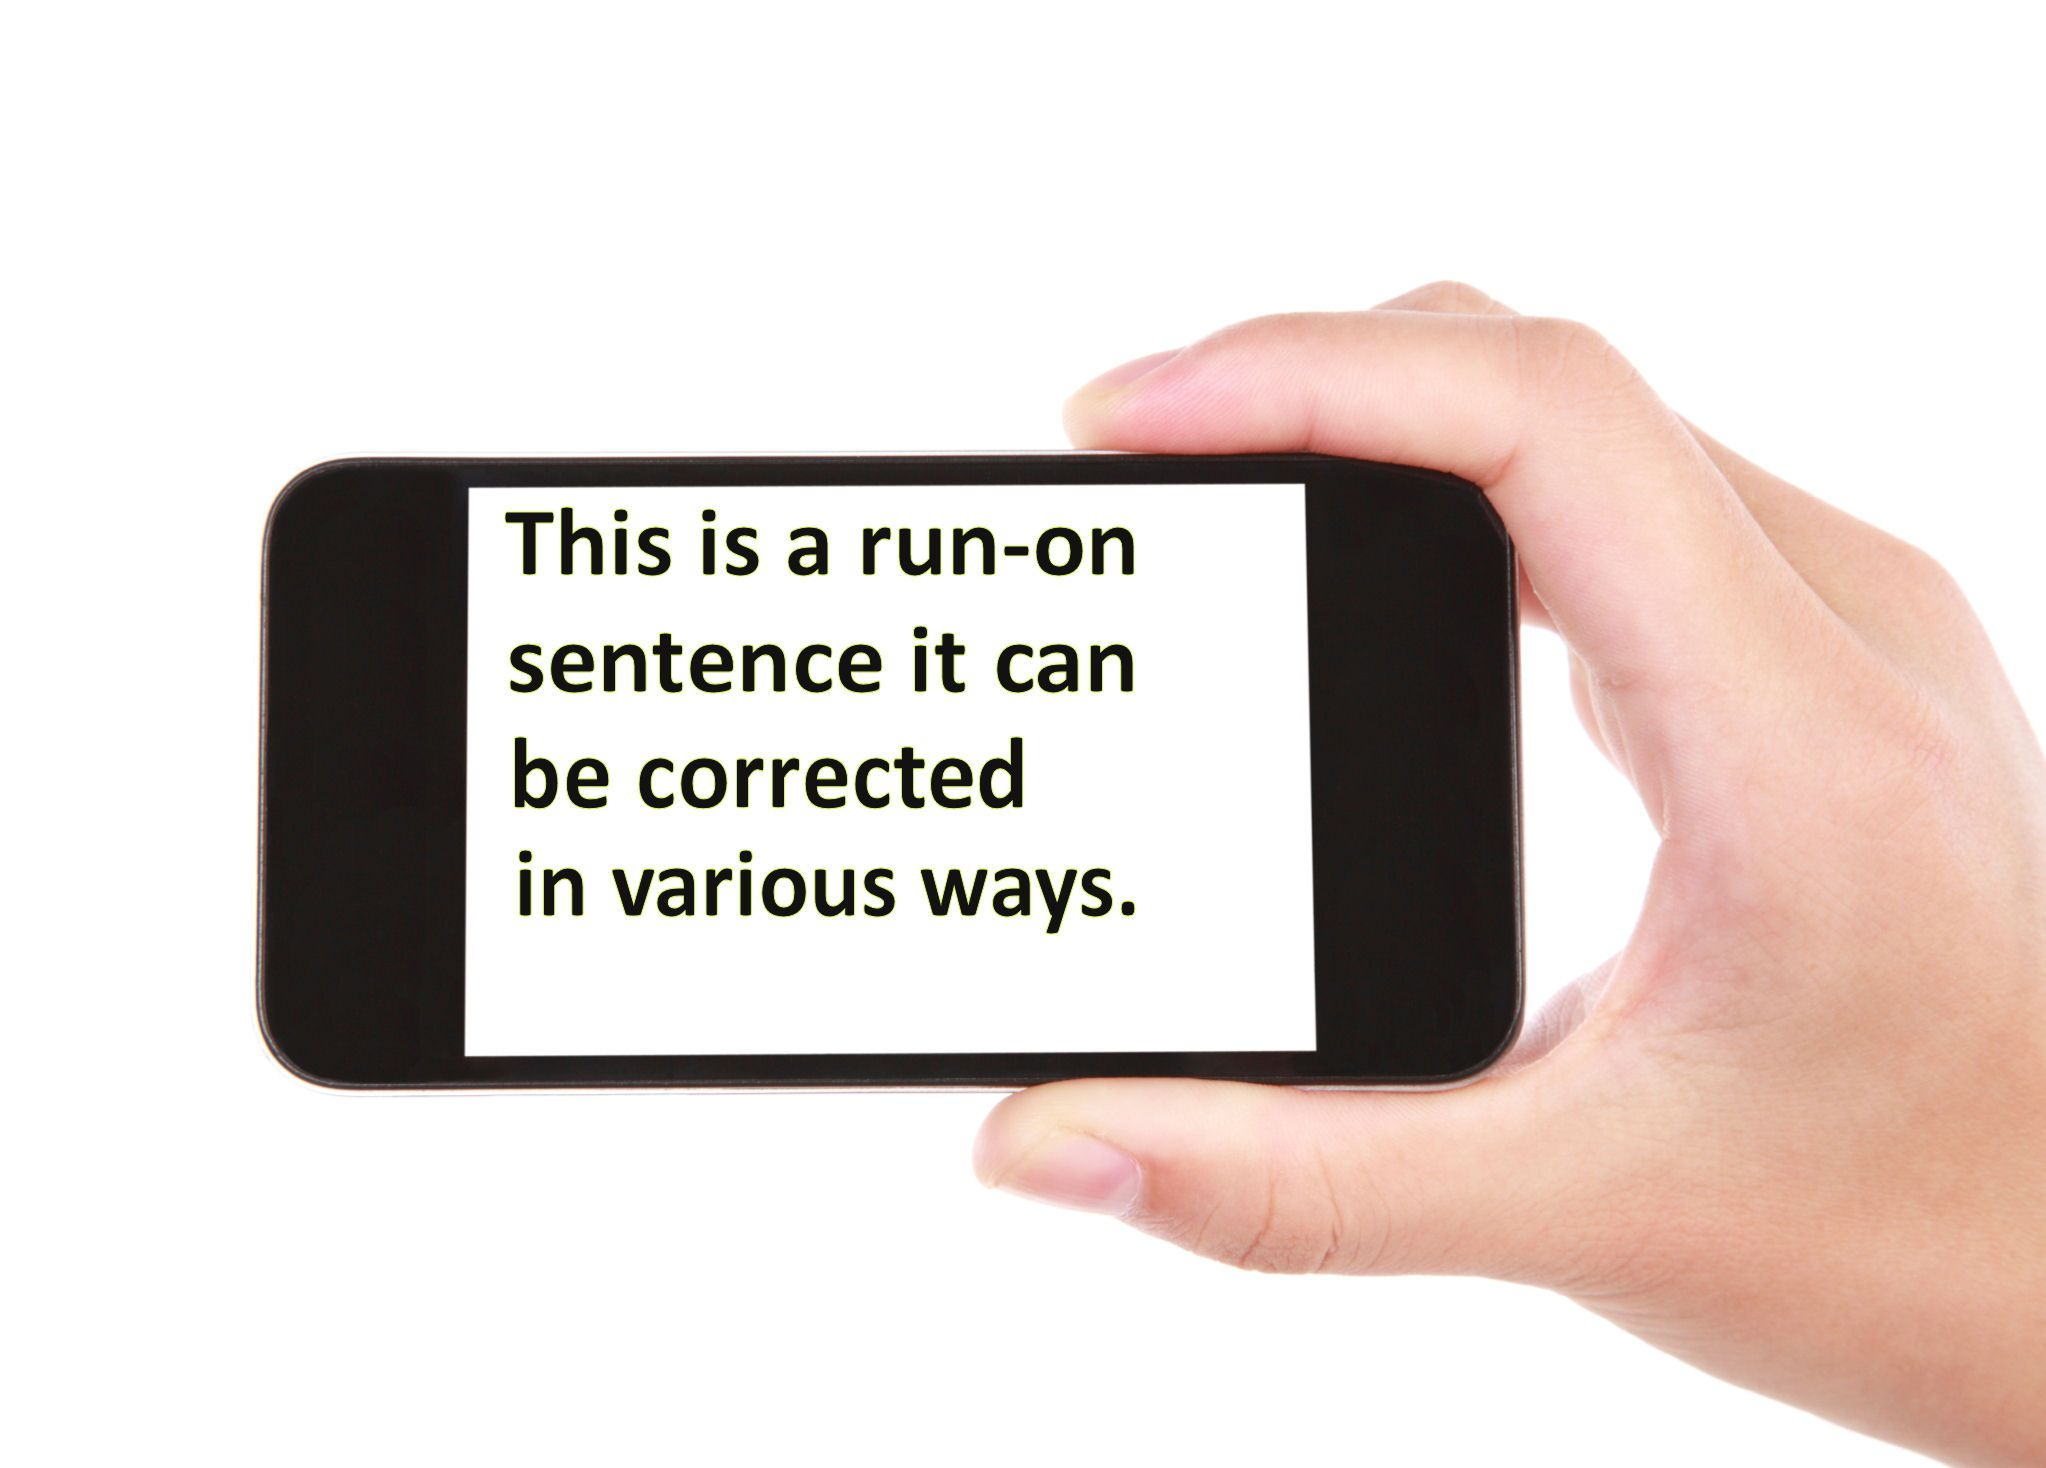 Ways of Correcting Run-on Sentences